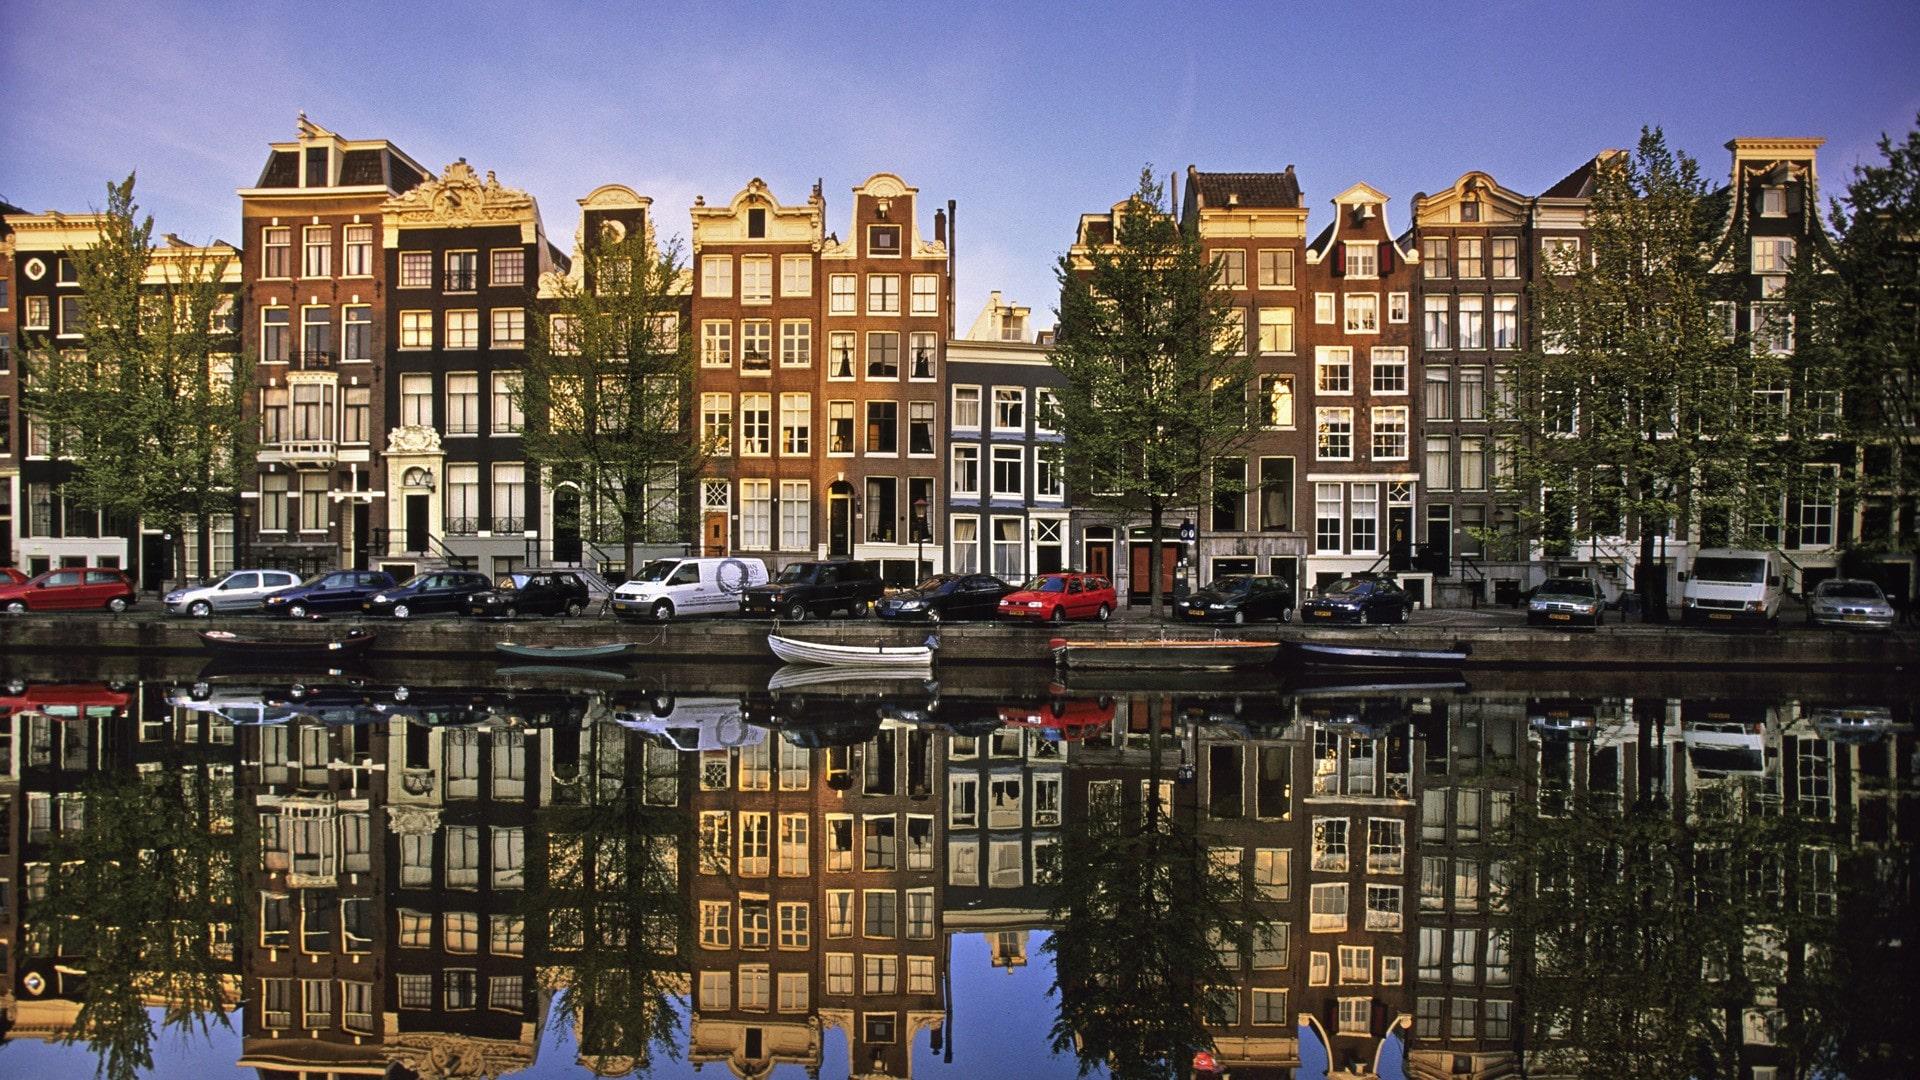 Amsterdam High